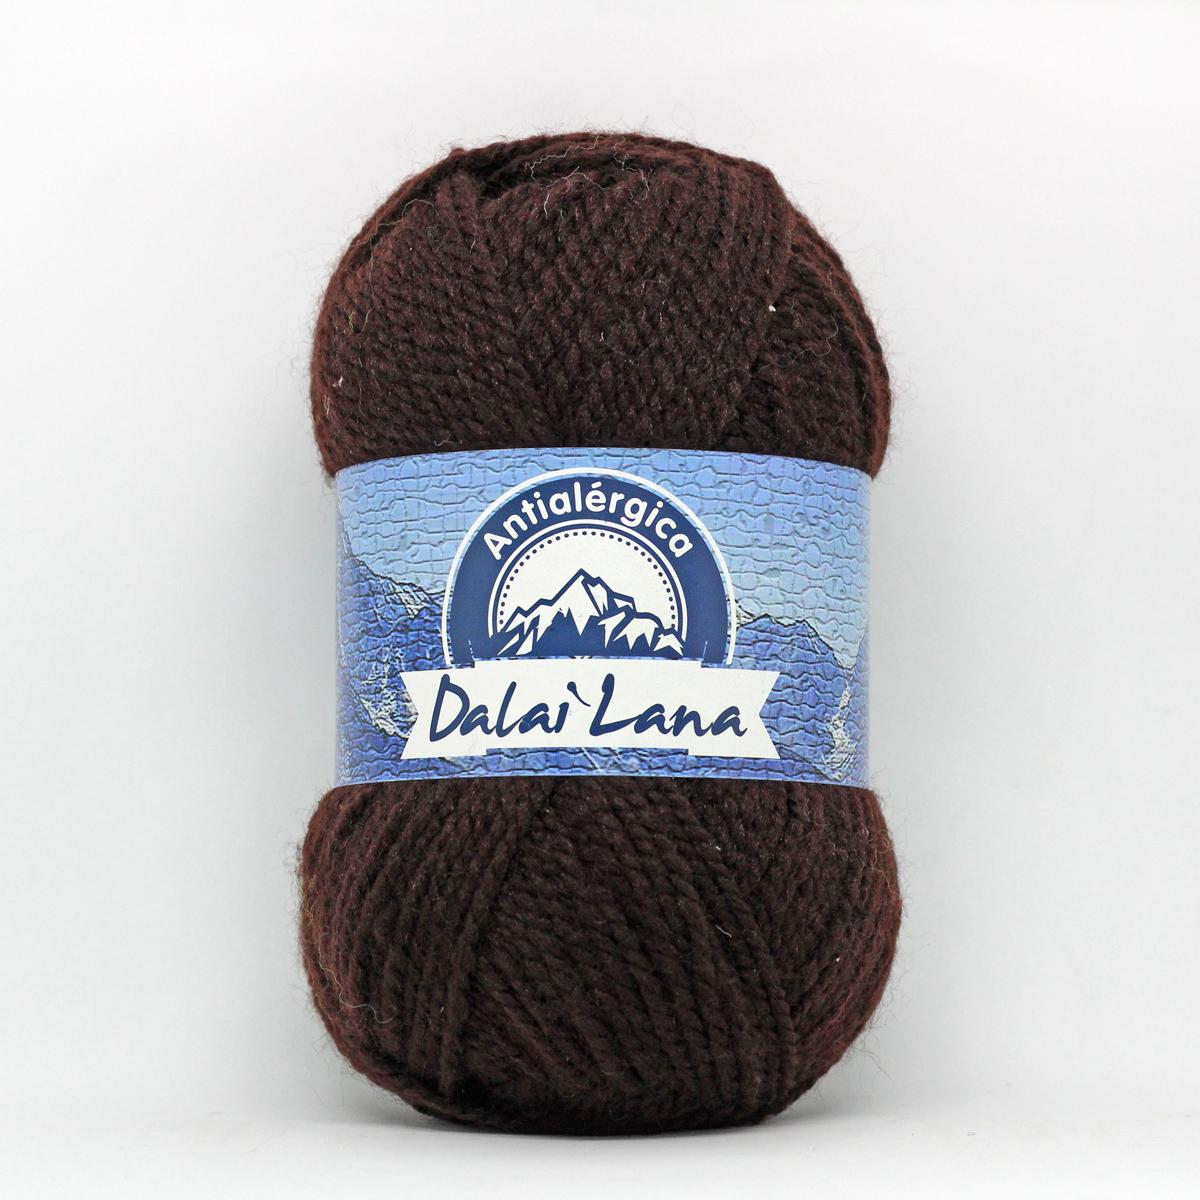 Dalai Lana - 754